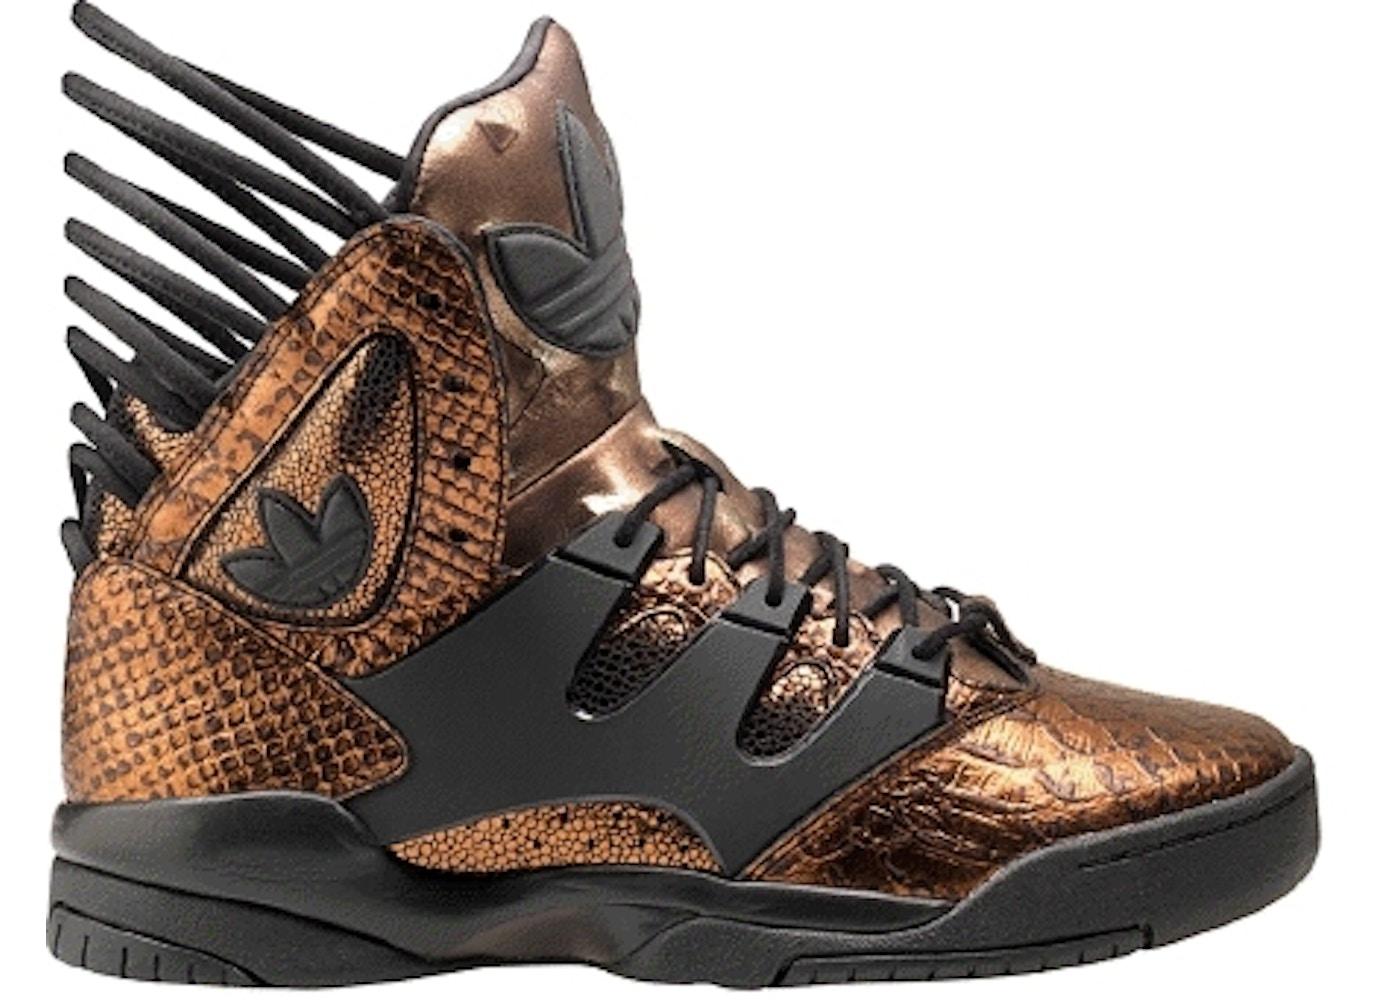 buy online 7f8c4 91c67 adidas Originals Teyana Taylor Harlem GLC (GS)